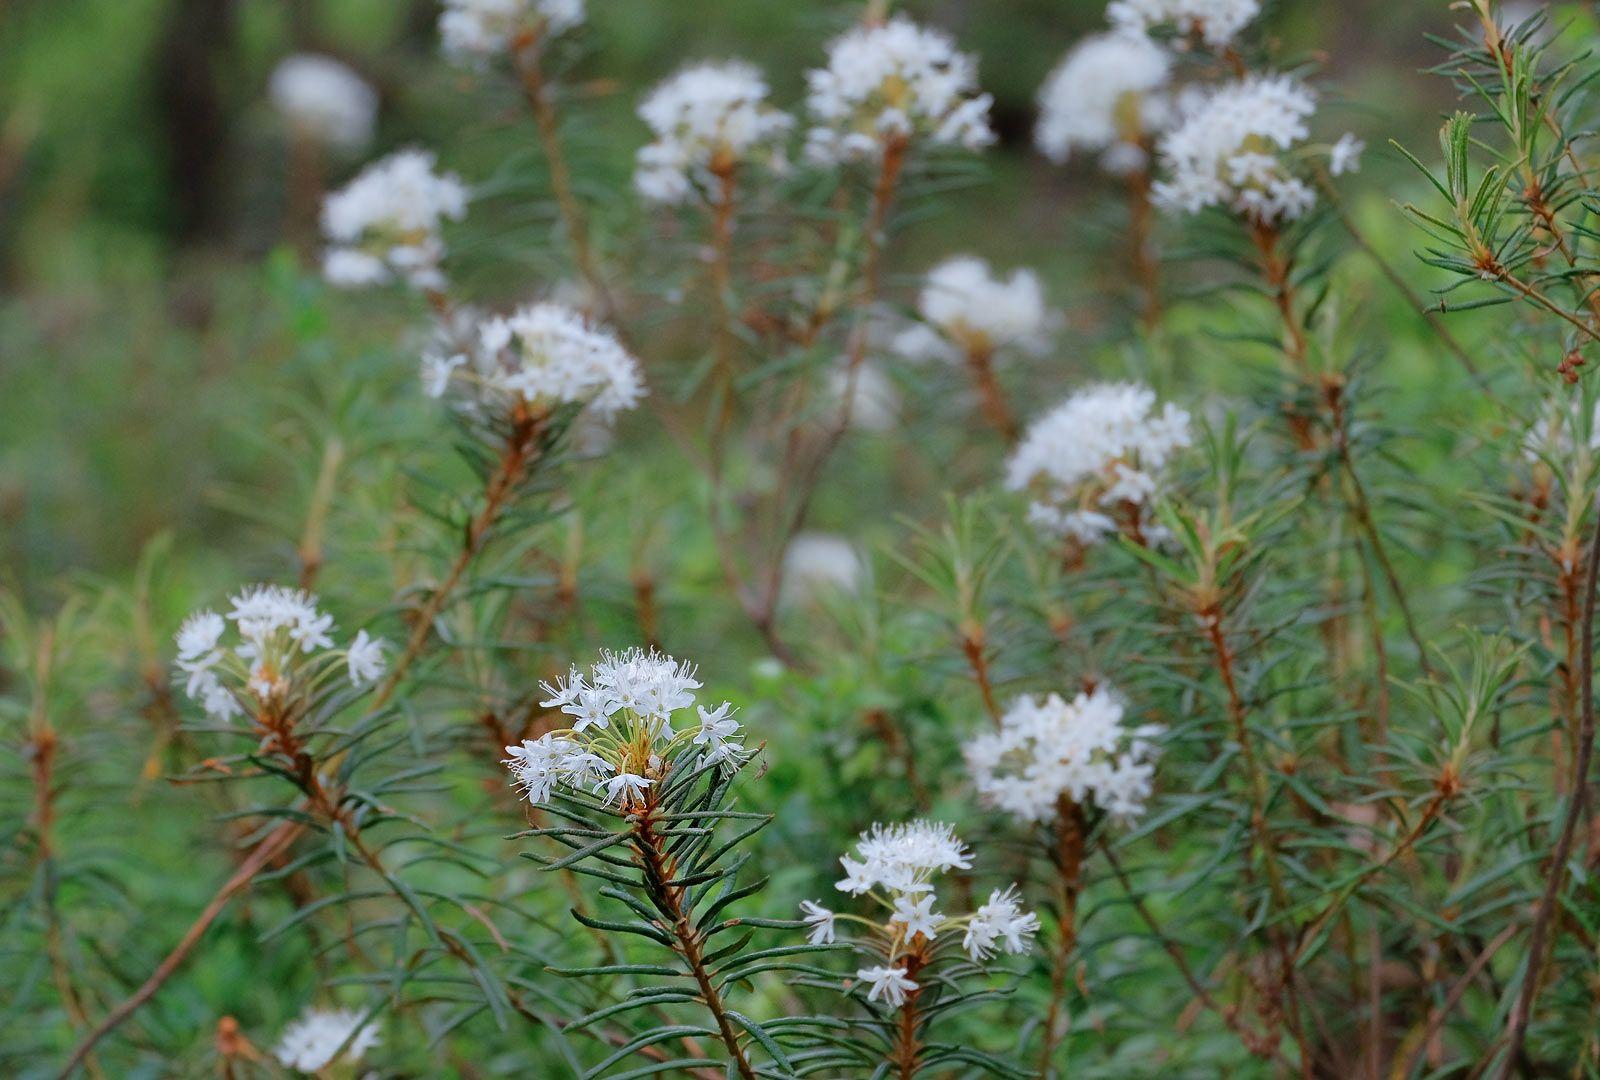 Bagno Zwyczajne Rhododendron Tomentosum Ledum Palustre Rhododendron